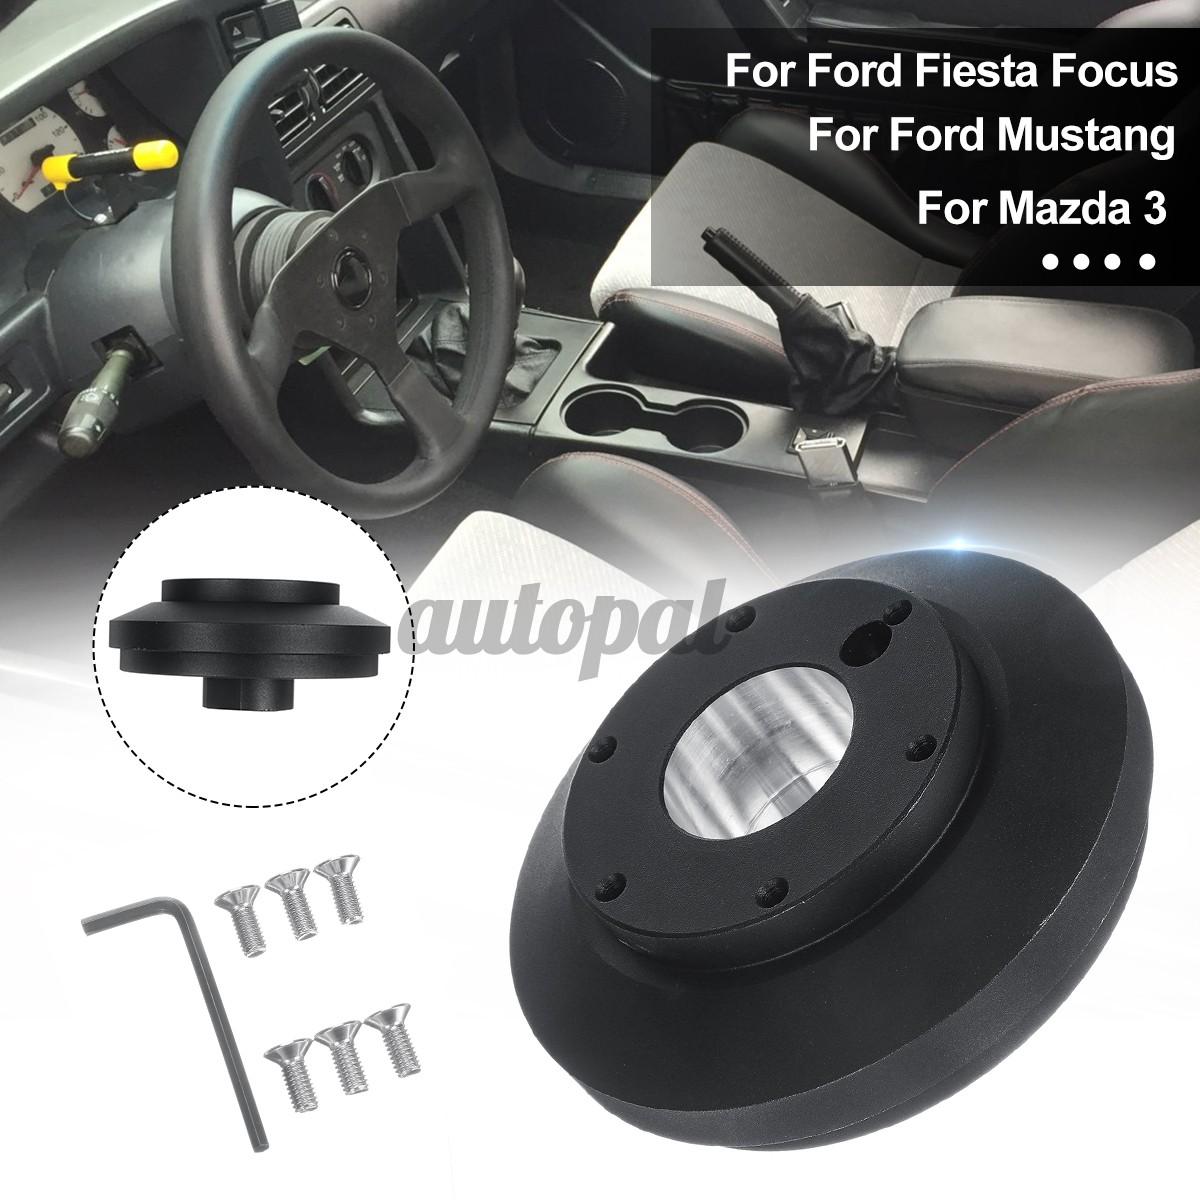 Srk 175h Aluminium Steering Wheel Short Hub Adapter For Ford Fiesta Focus Mustang Mazda 3 Shopee Philippines